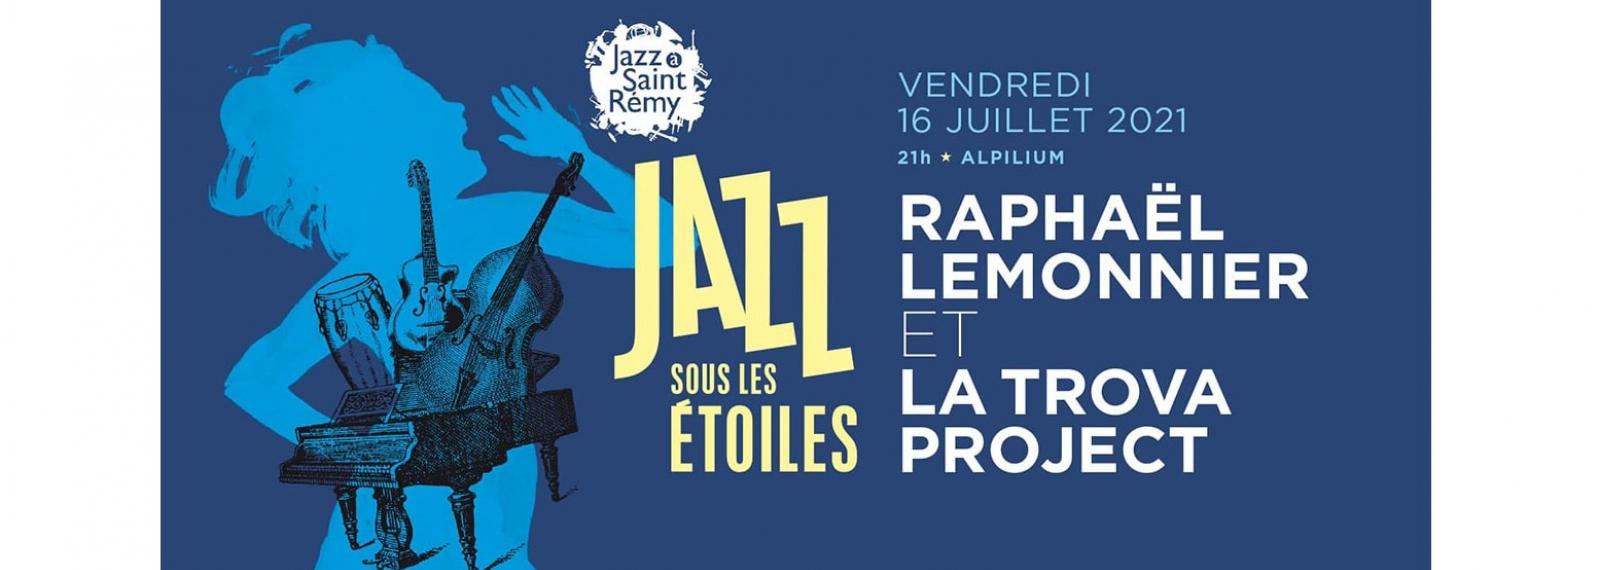 Jazz à Saint-Rémy